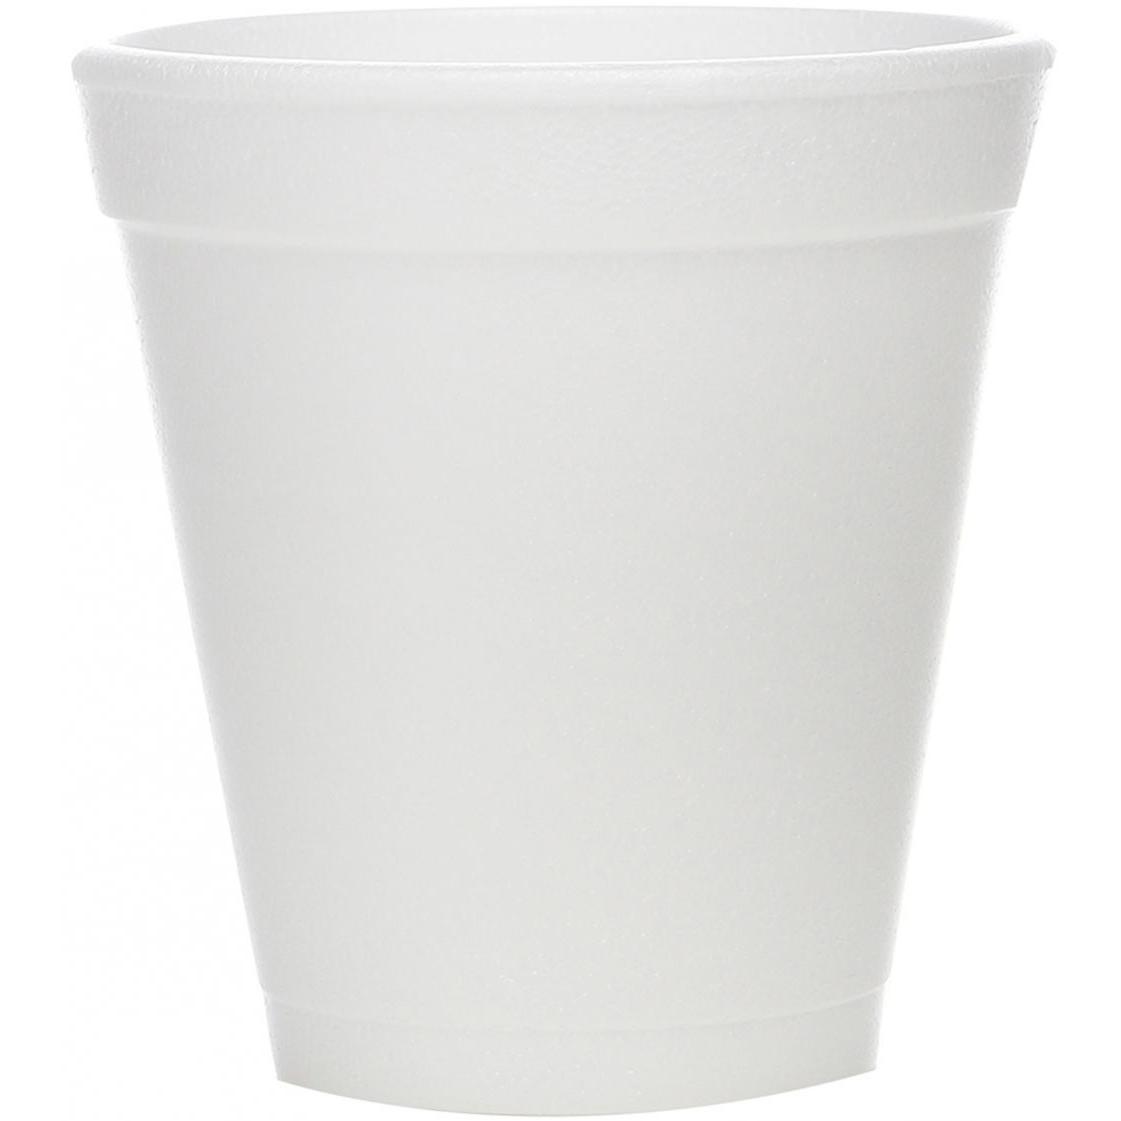 Hotpack FC6 Foam Cup - 6oz (pkt/25pcs)